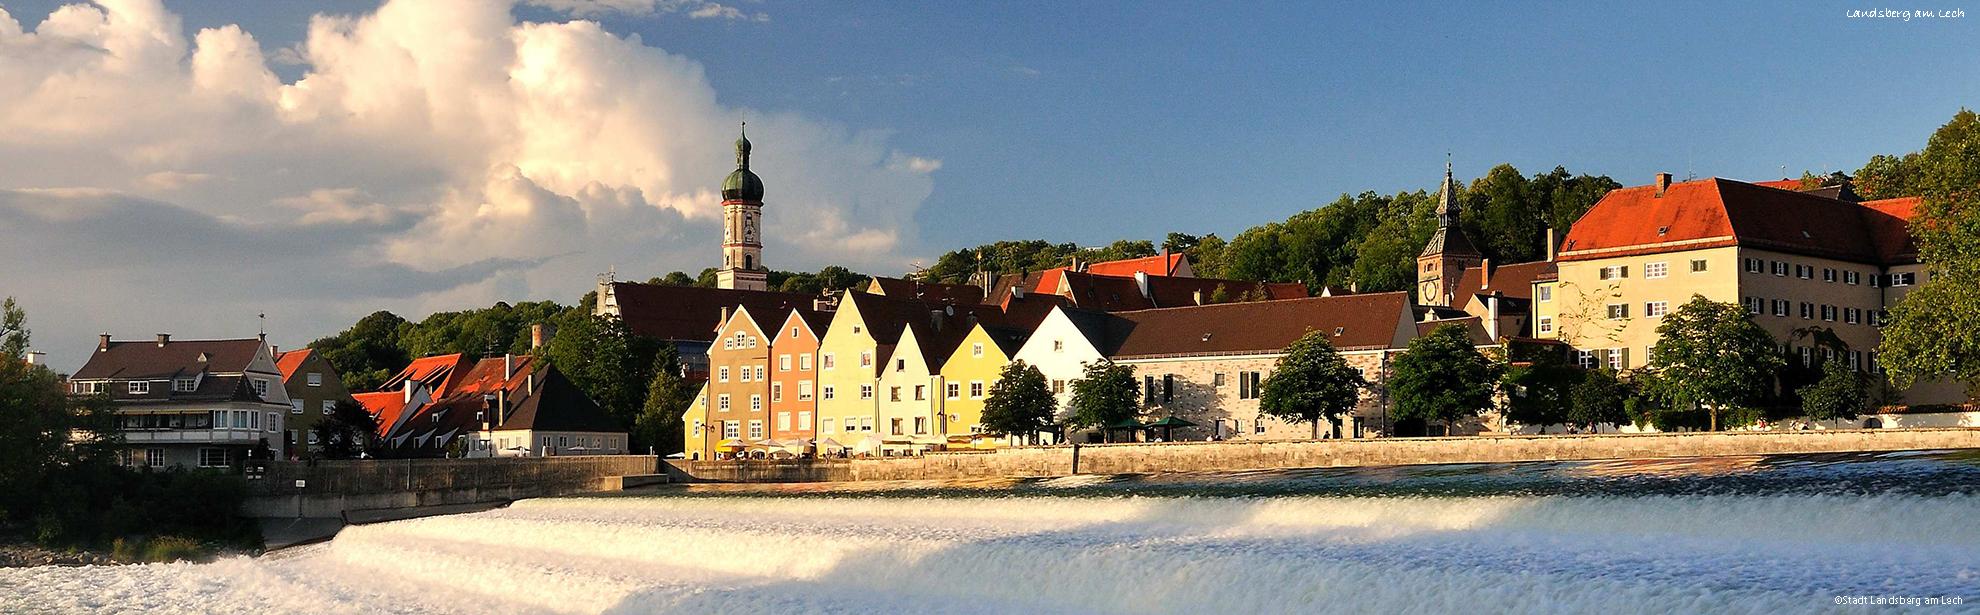 OsportStadt-Landsberg-aL_Lechwehr_D3C0124